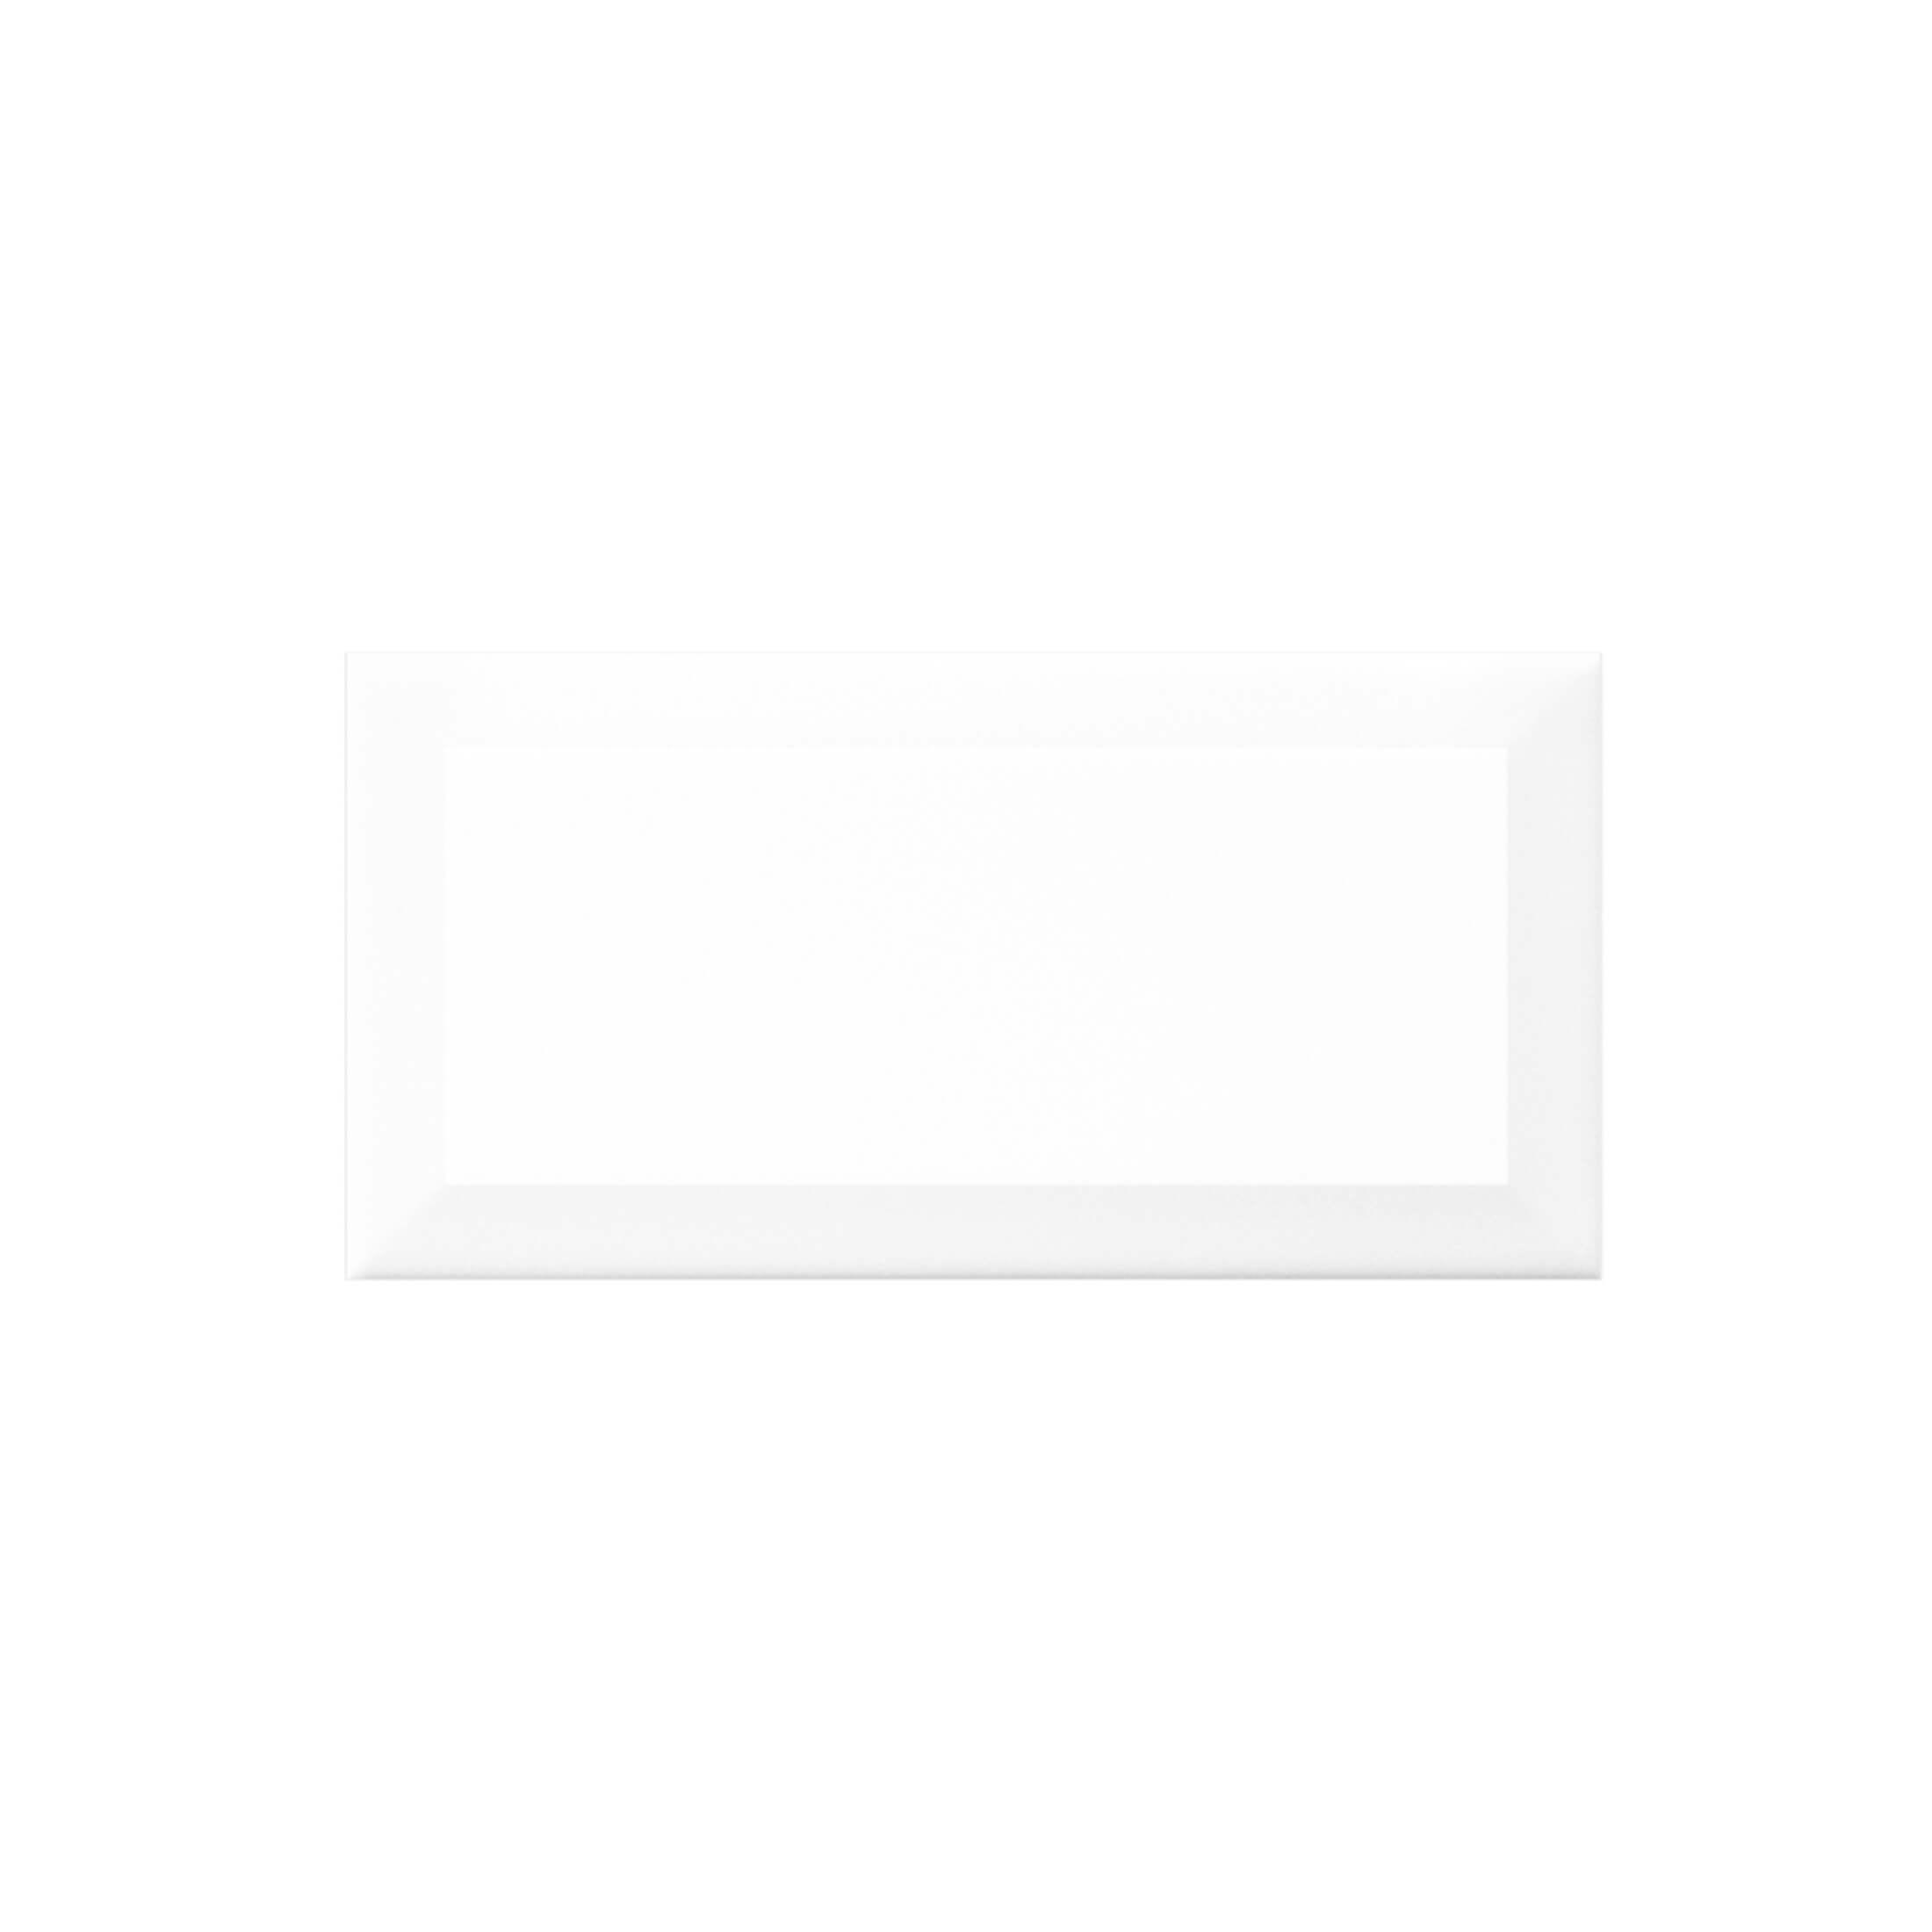 ADNE2039 - BISELADO PB - 10 cm X 20 cm